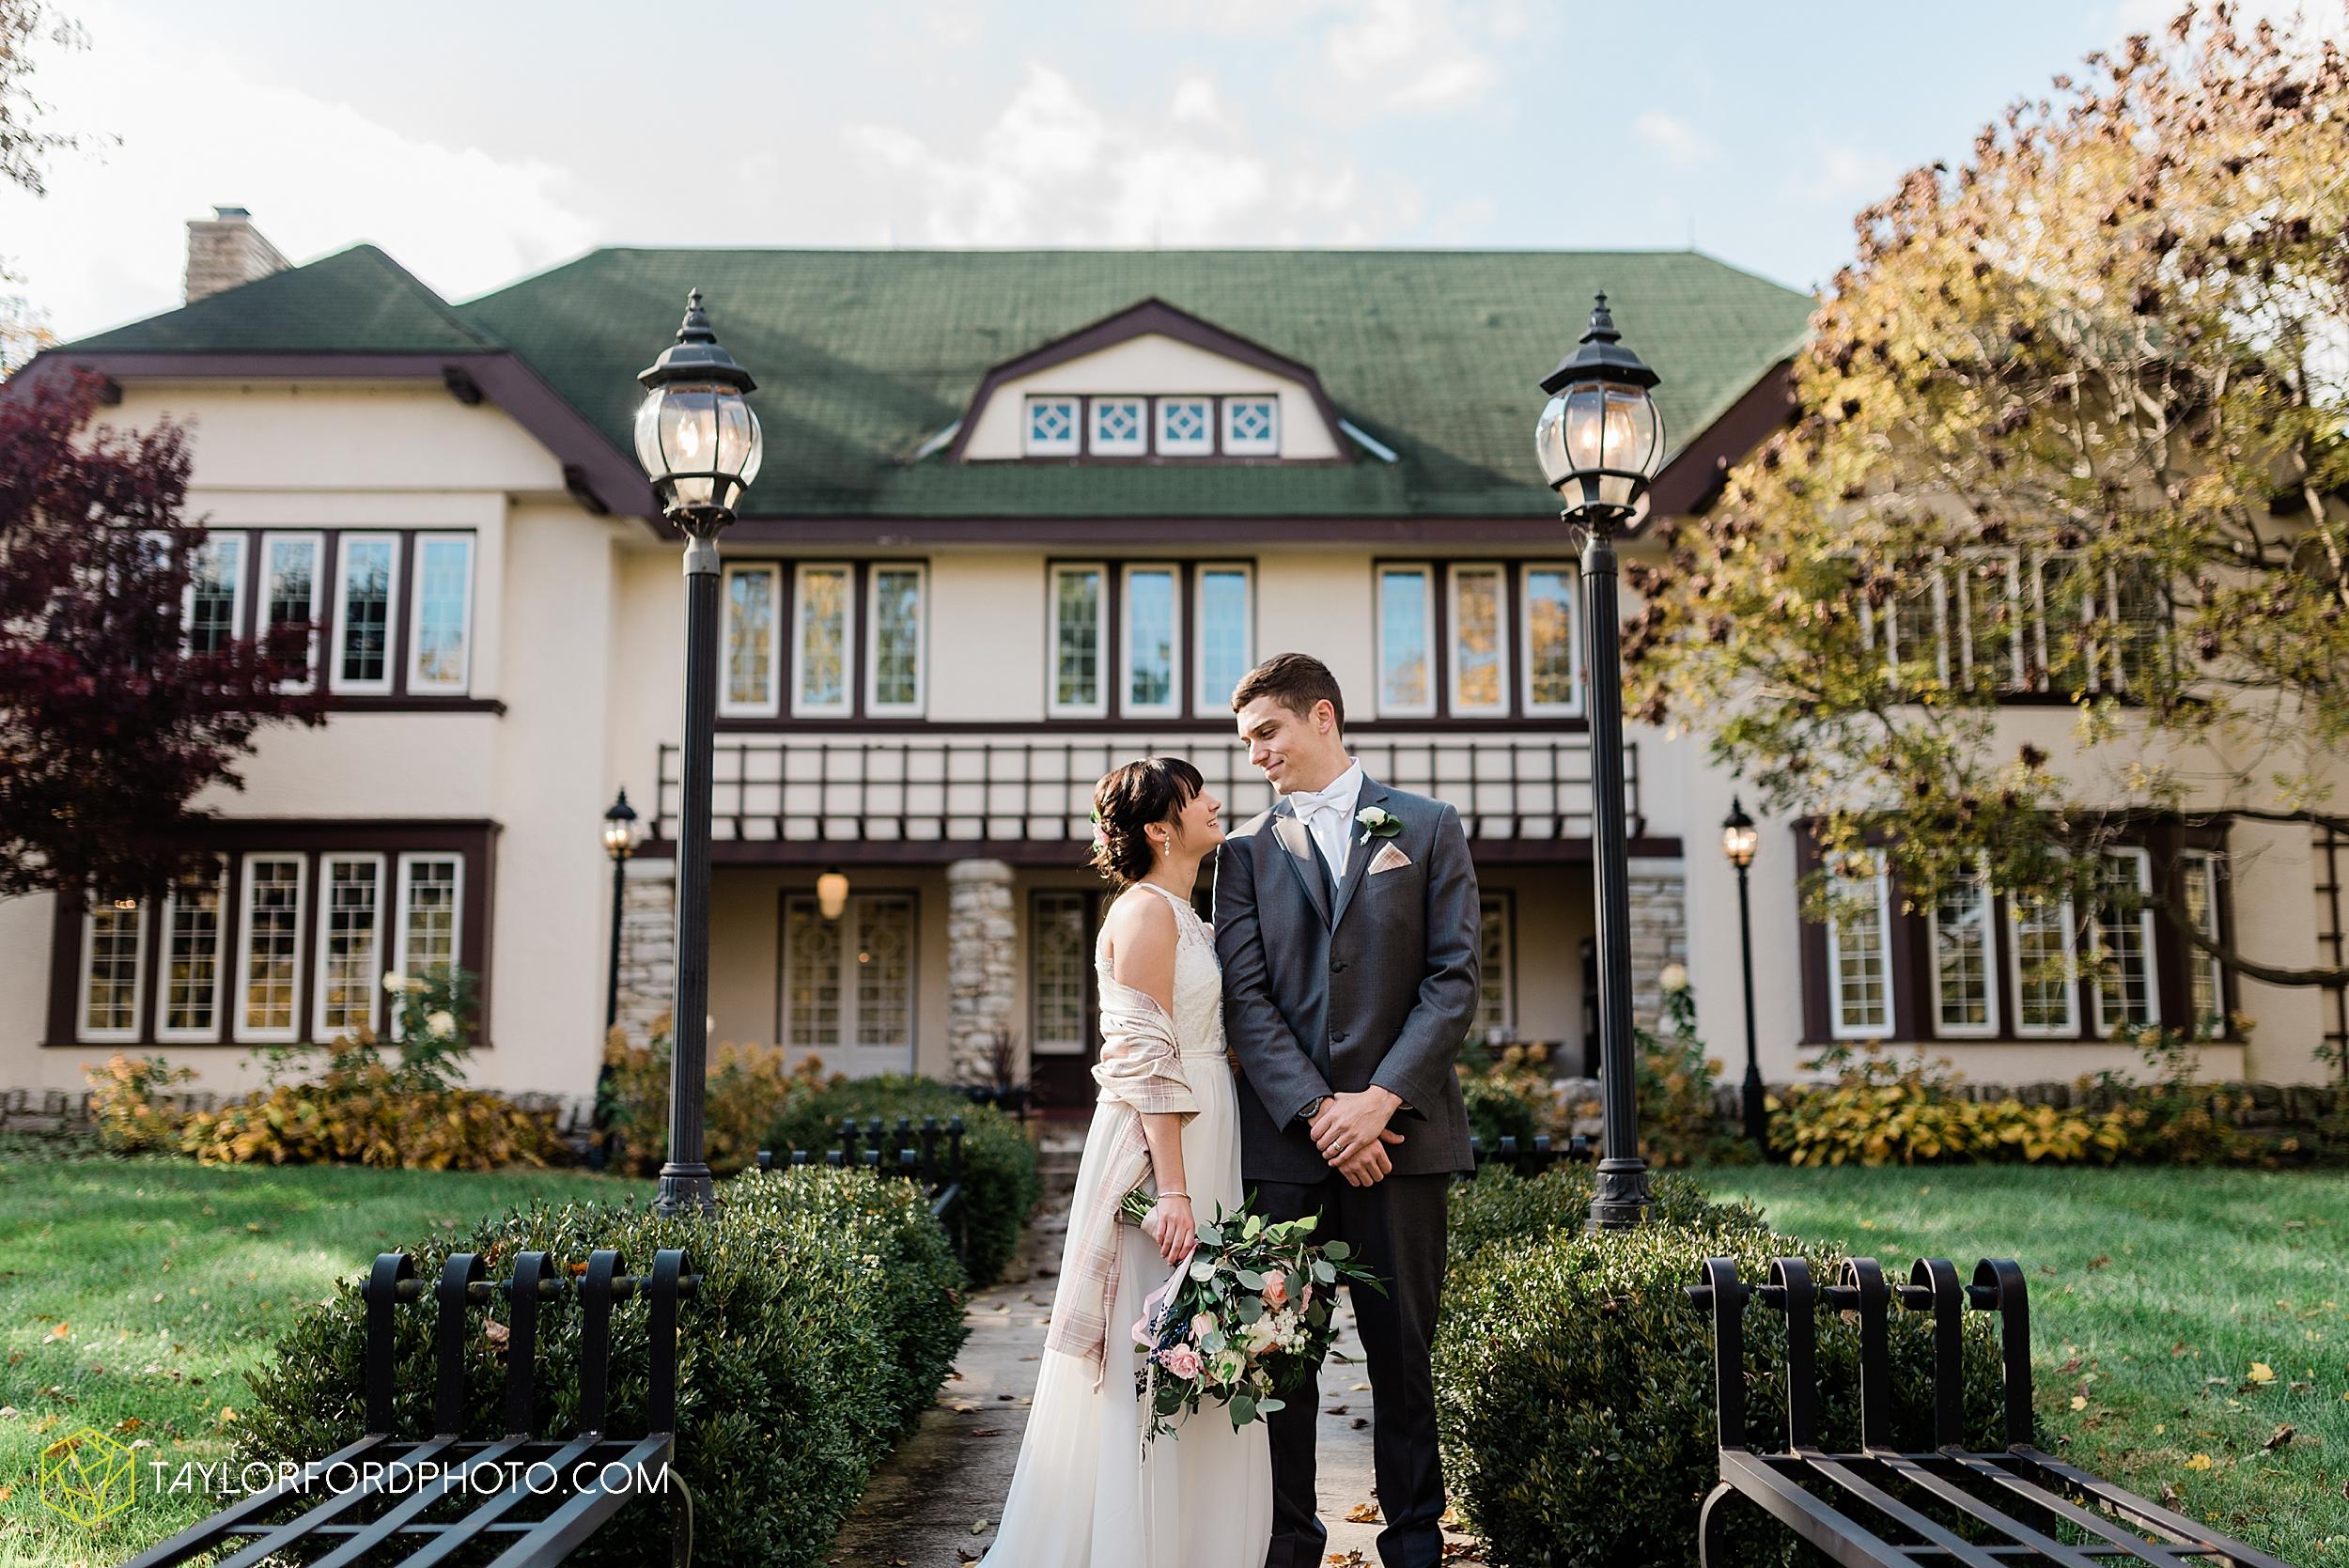 marissa-nicole-nick-daeger-orrmont-estate-farm-wedding-piqua-dayton-troy-ohio-fall-photographer-taylor-ford-photography_1517.jpg